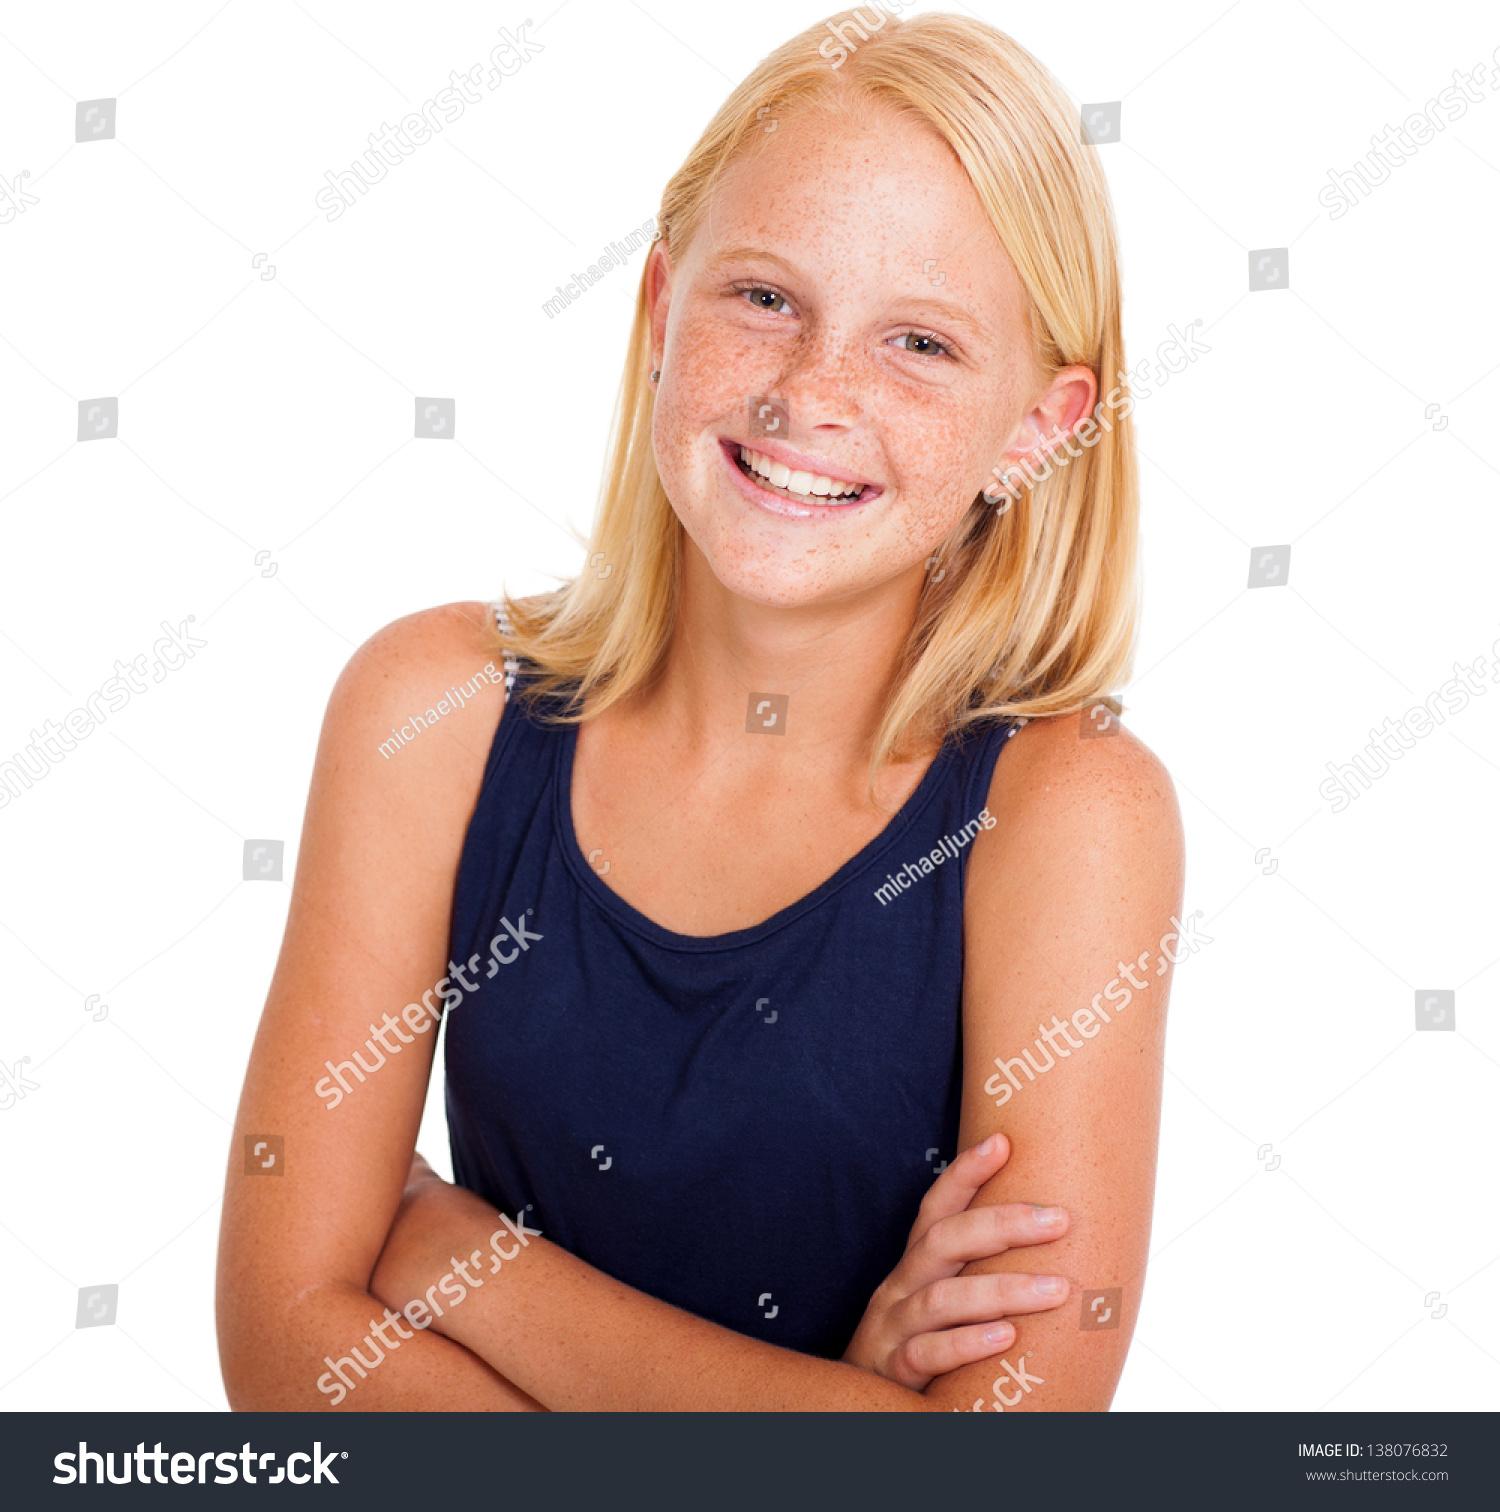 Online image photo editor shutterstock editor - Image of teen ...